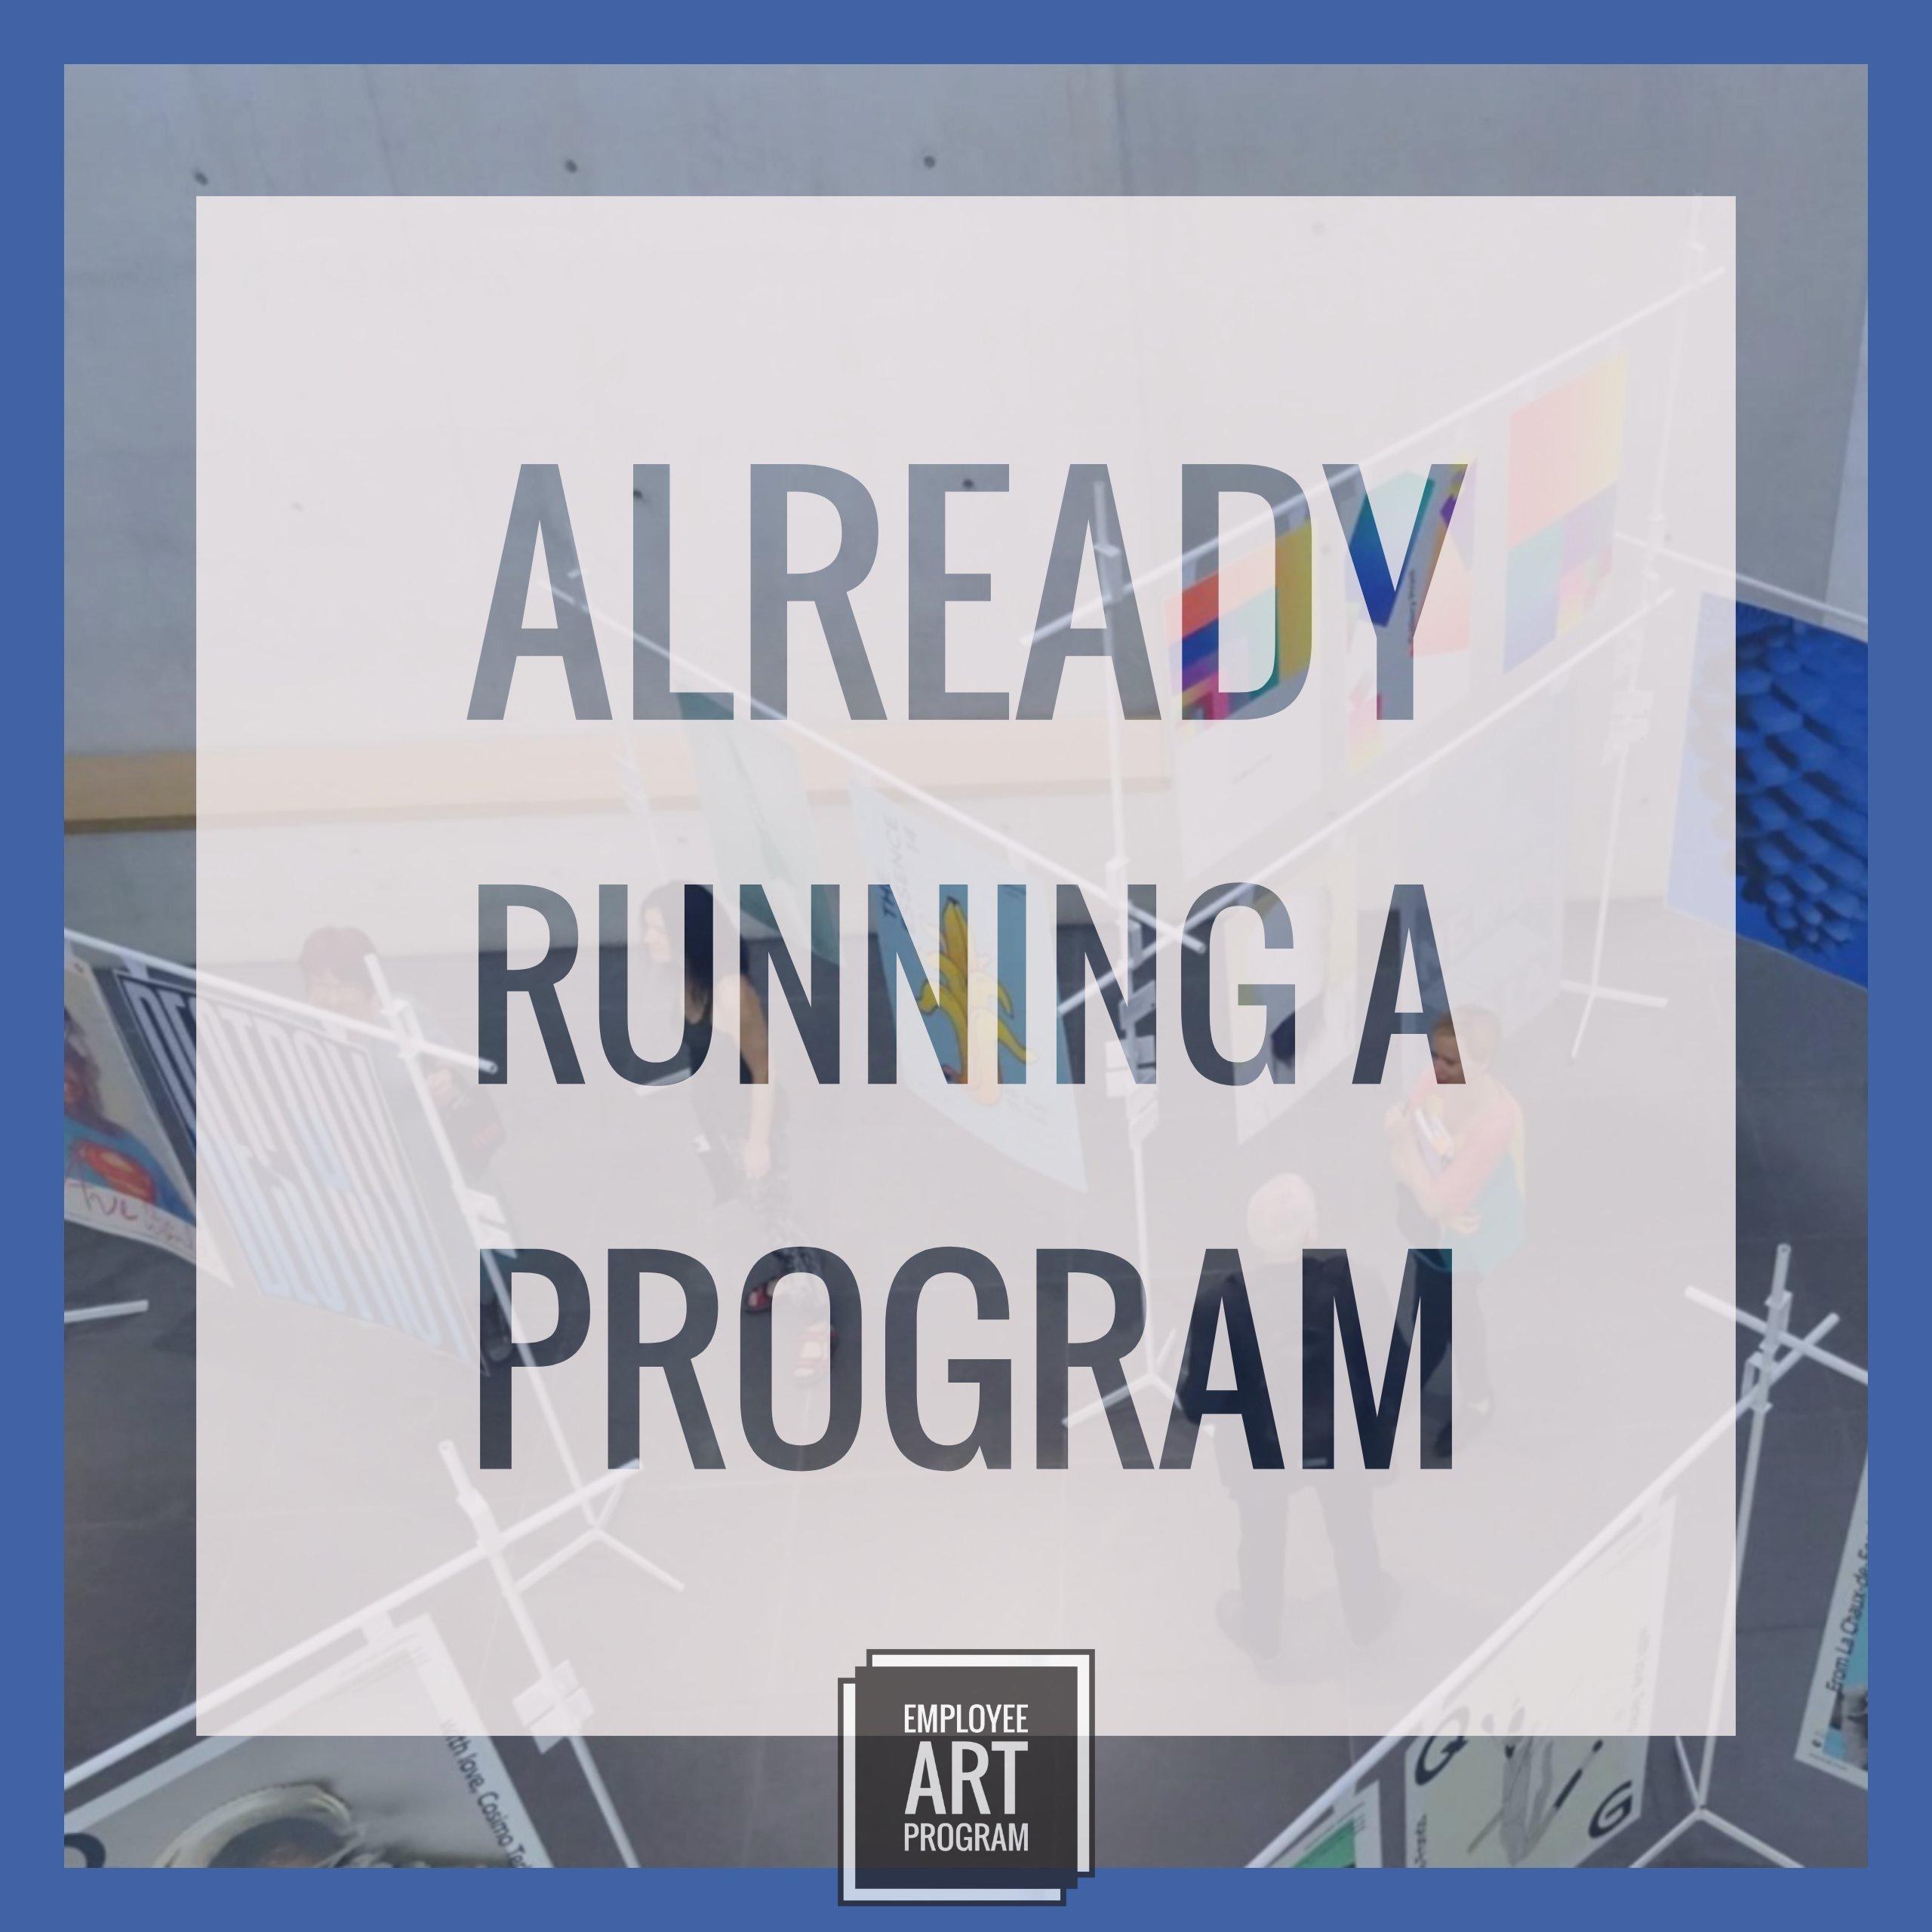 Login here if you are already running an employee art program